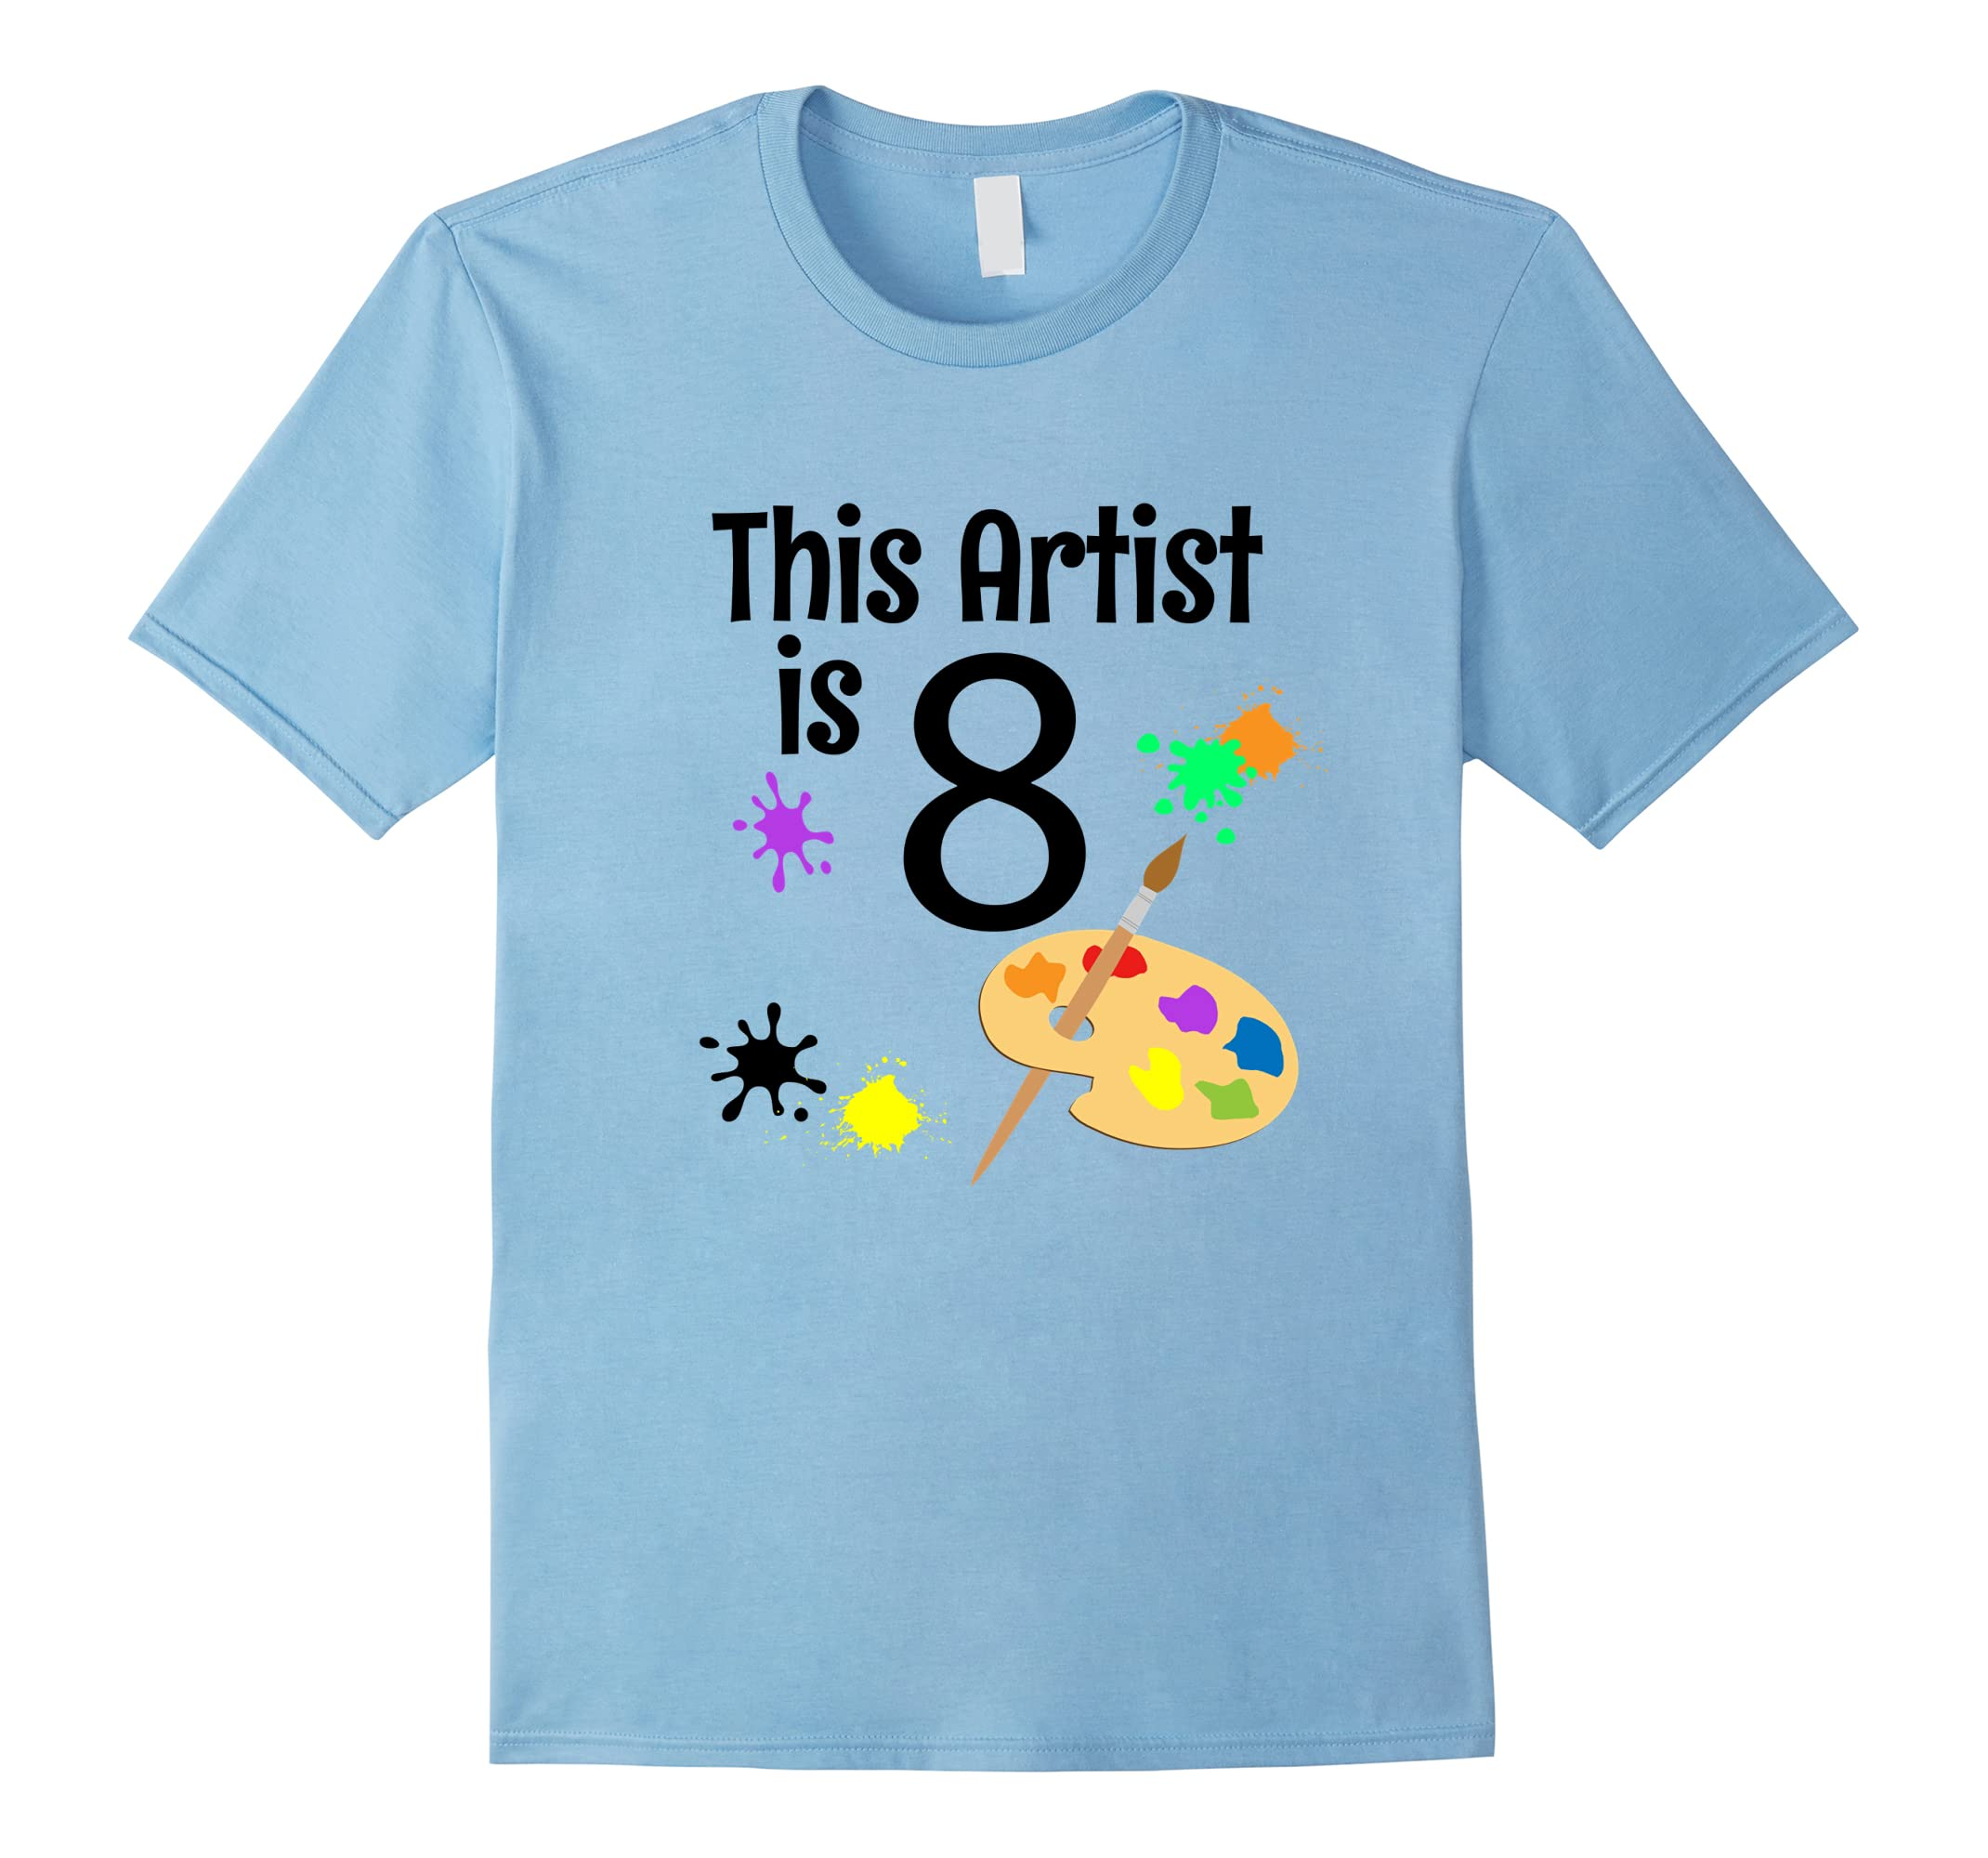 8 Year Old Art Painting Birthday Party 8th Shirt Teechatpro